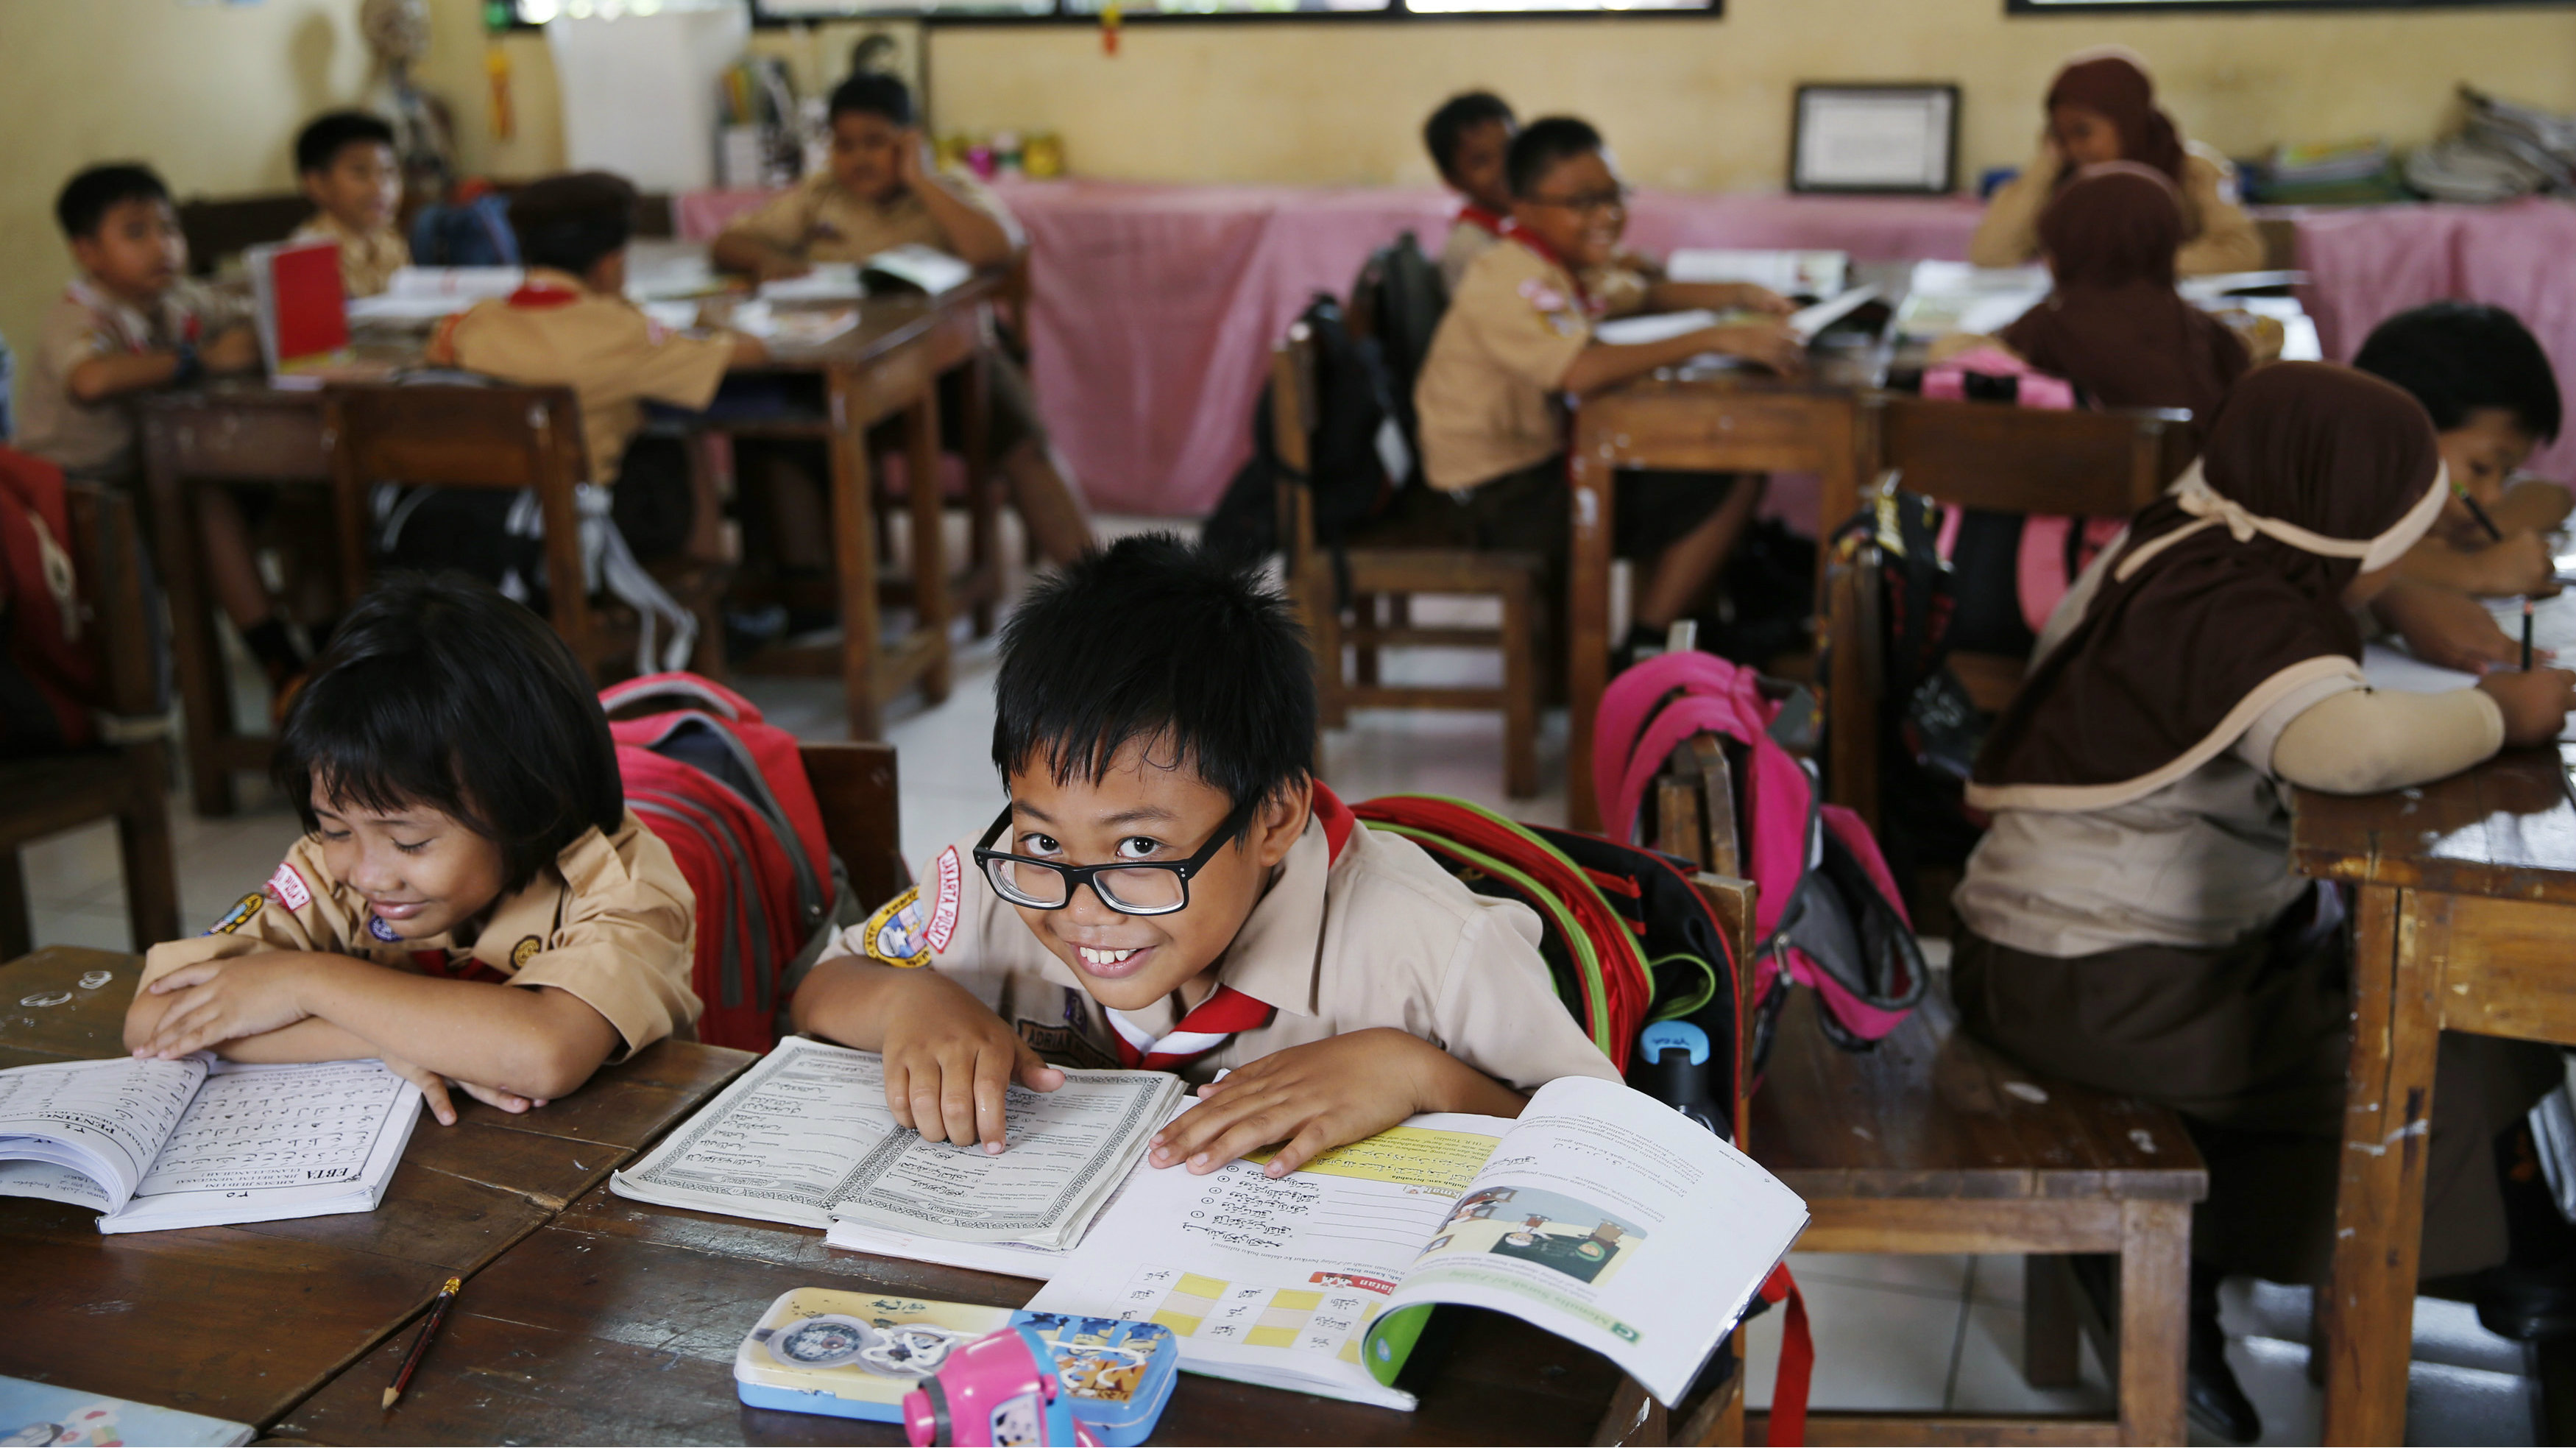 Student reacts to the camera as a teacher teaches the 2013 curriculum inside a classroom at Cempaka Putih